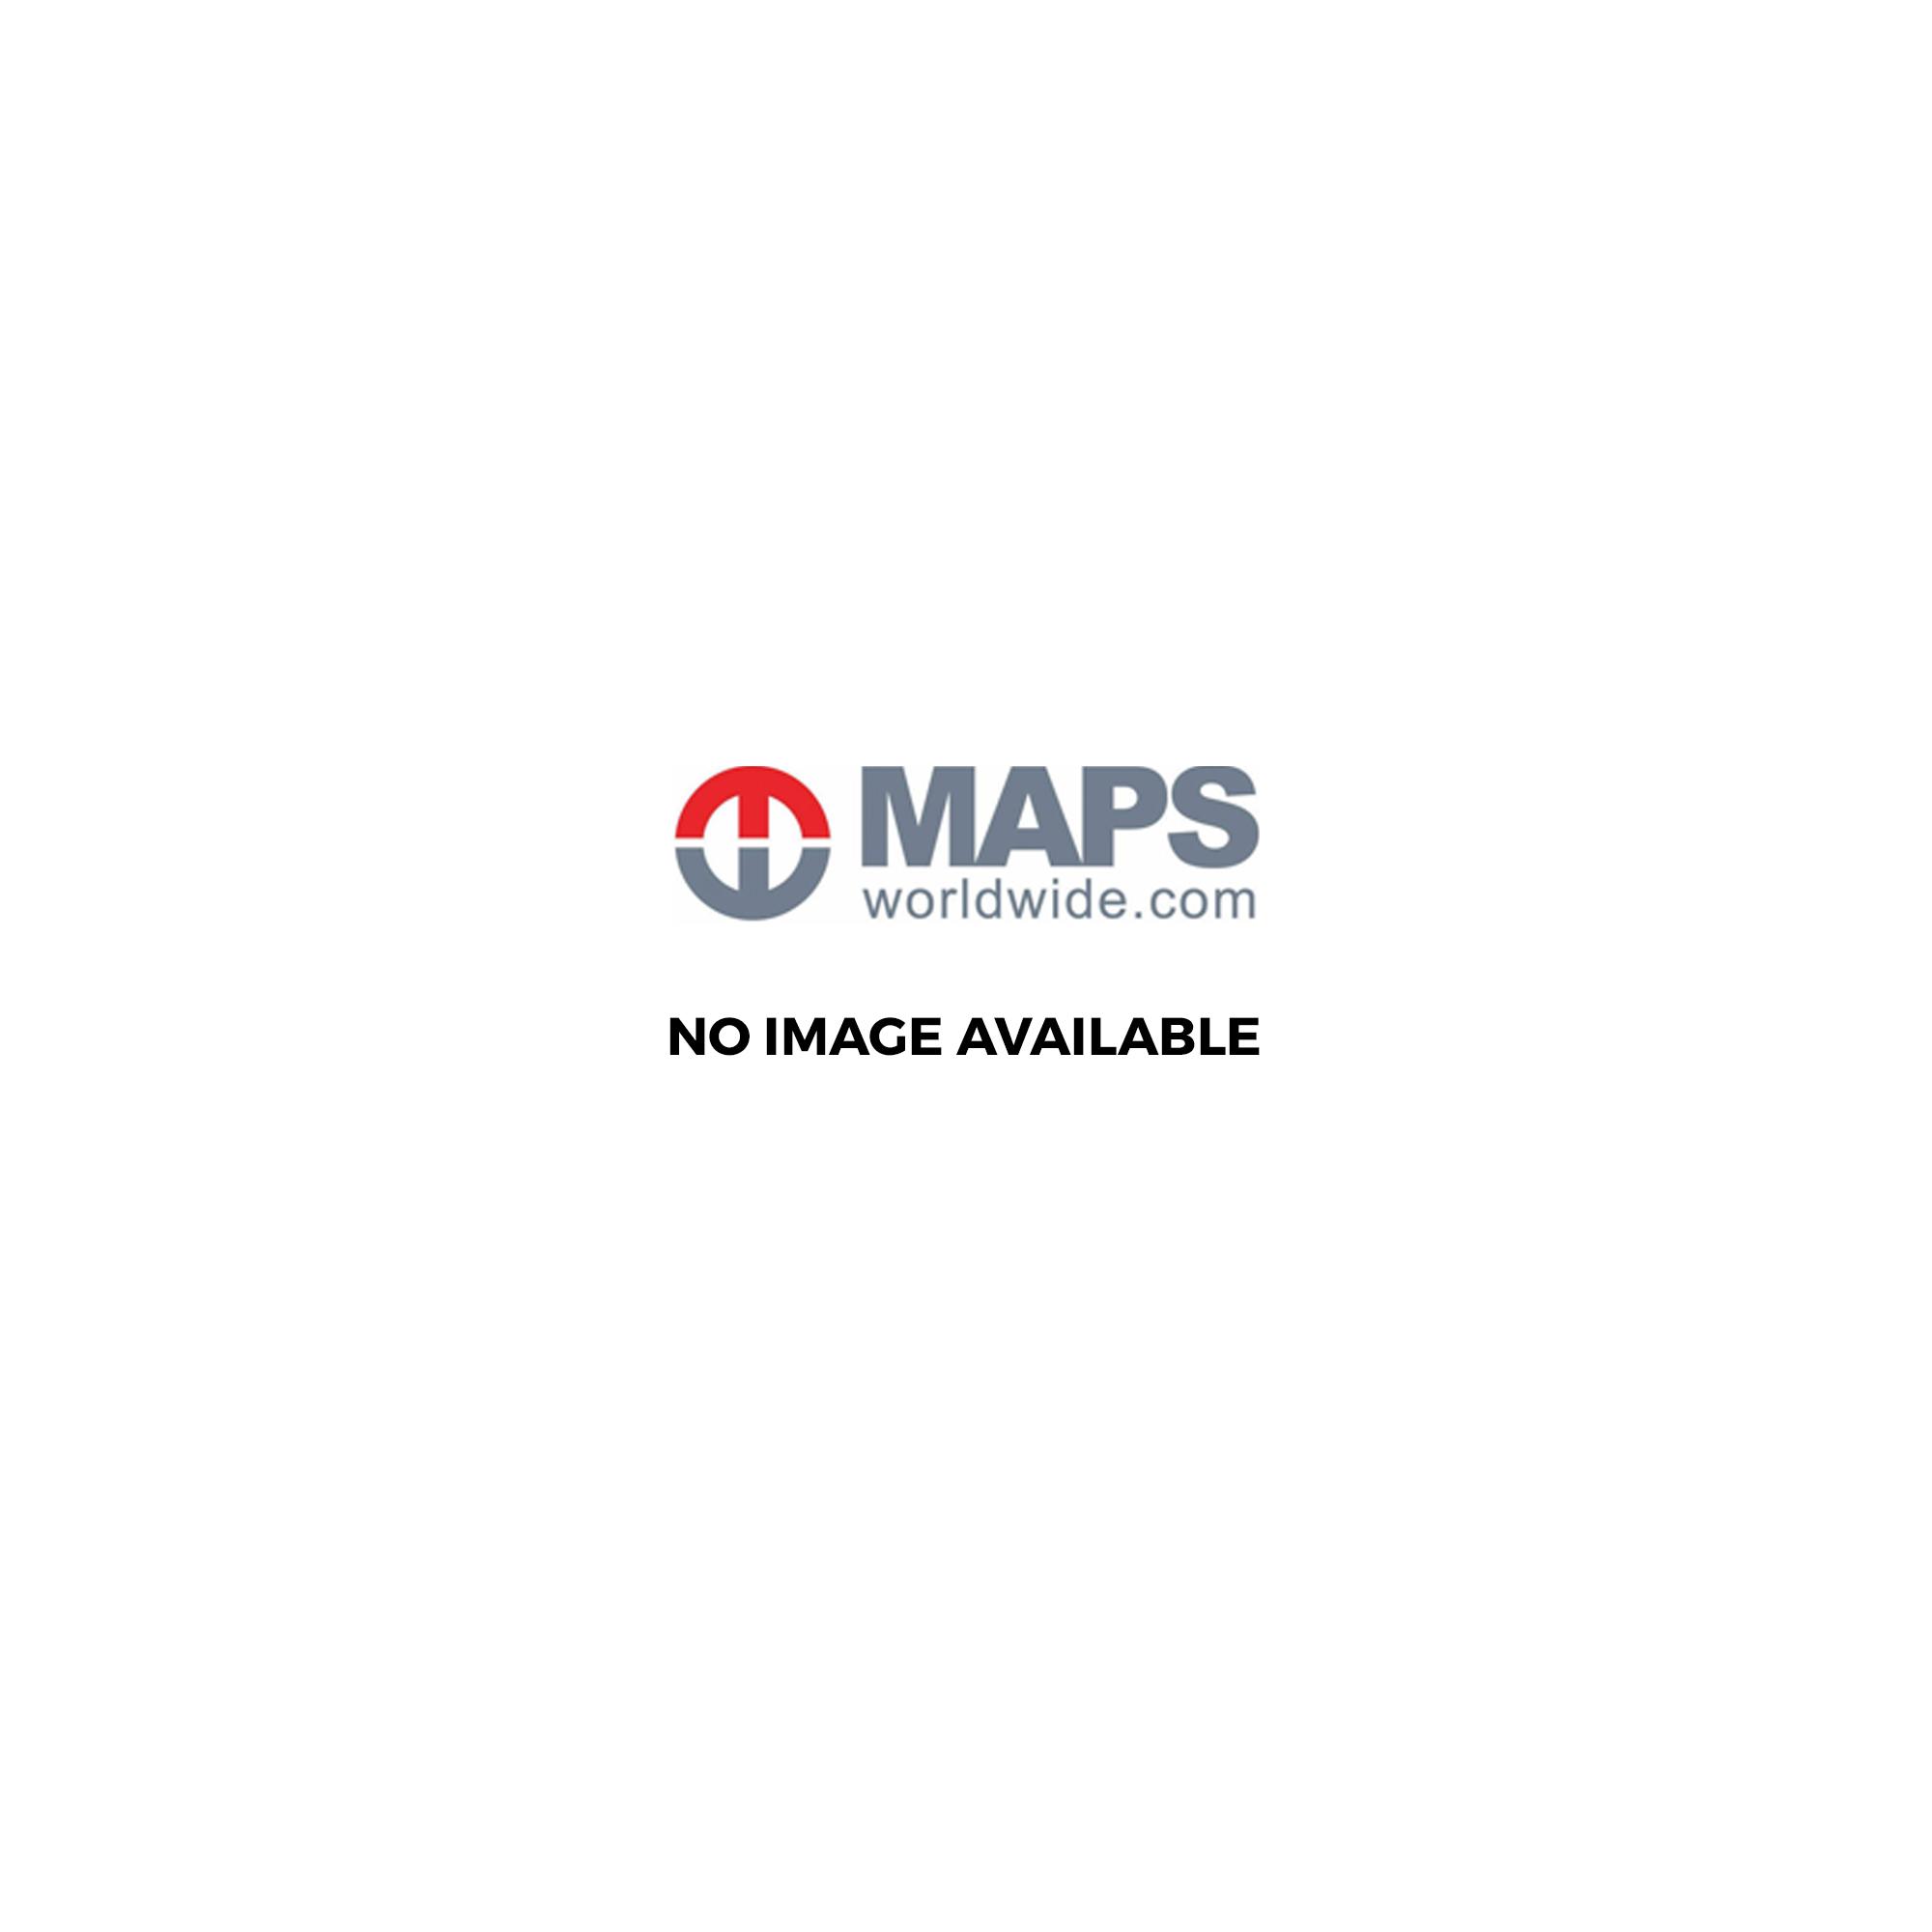 Map Of Northern France Coastline.France South Road Map By K F Hallwag Kummerley Frey